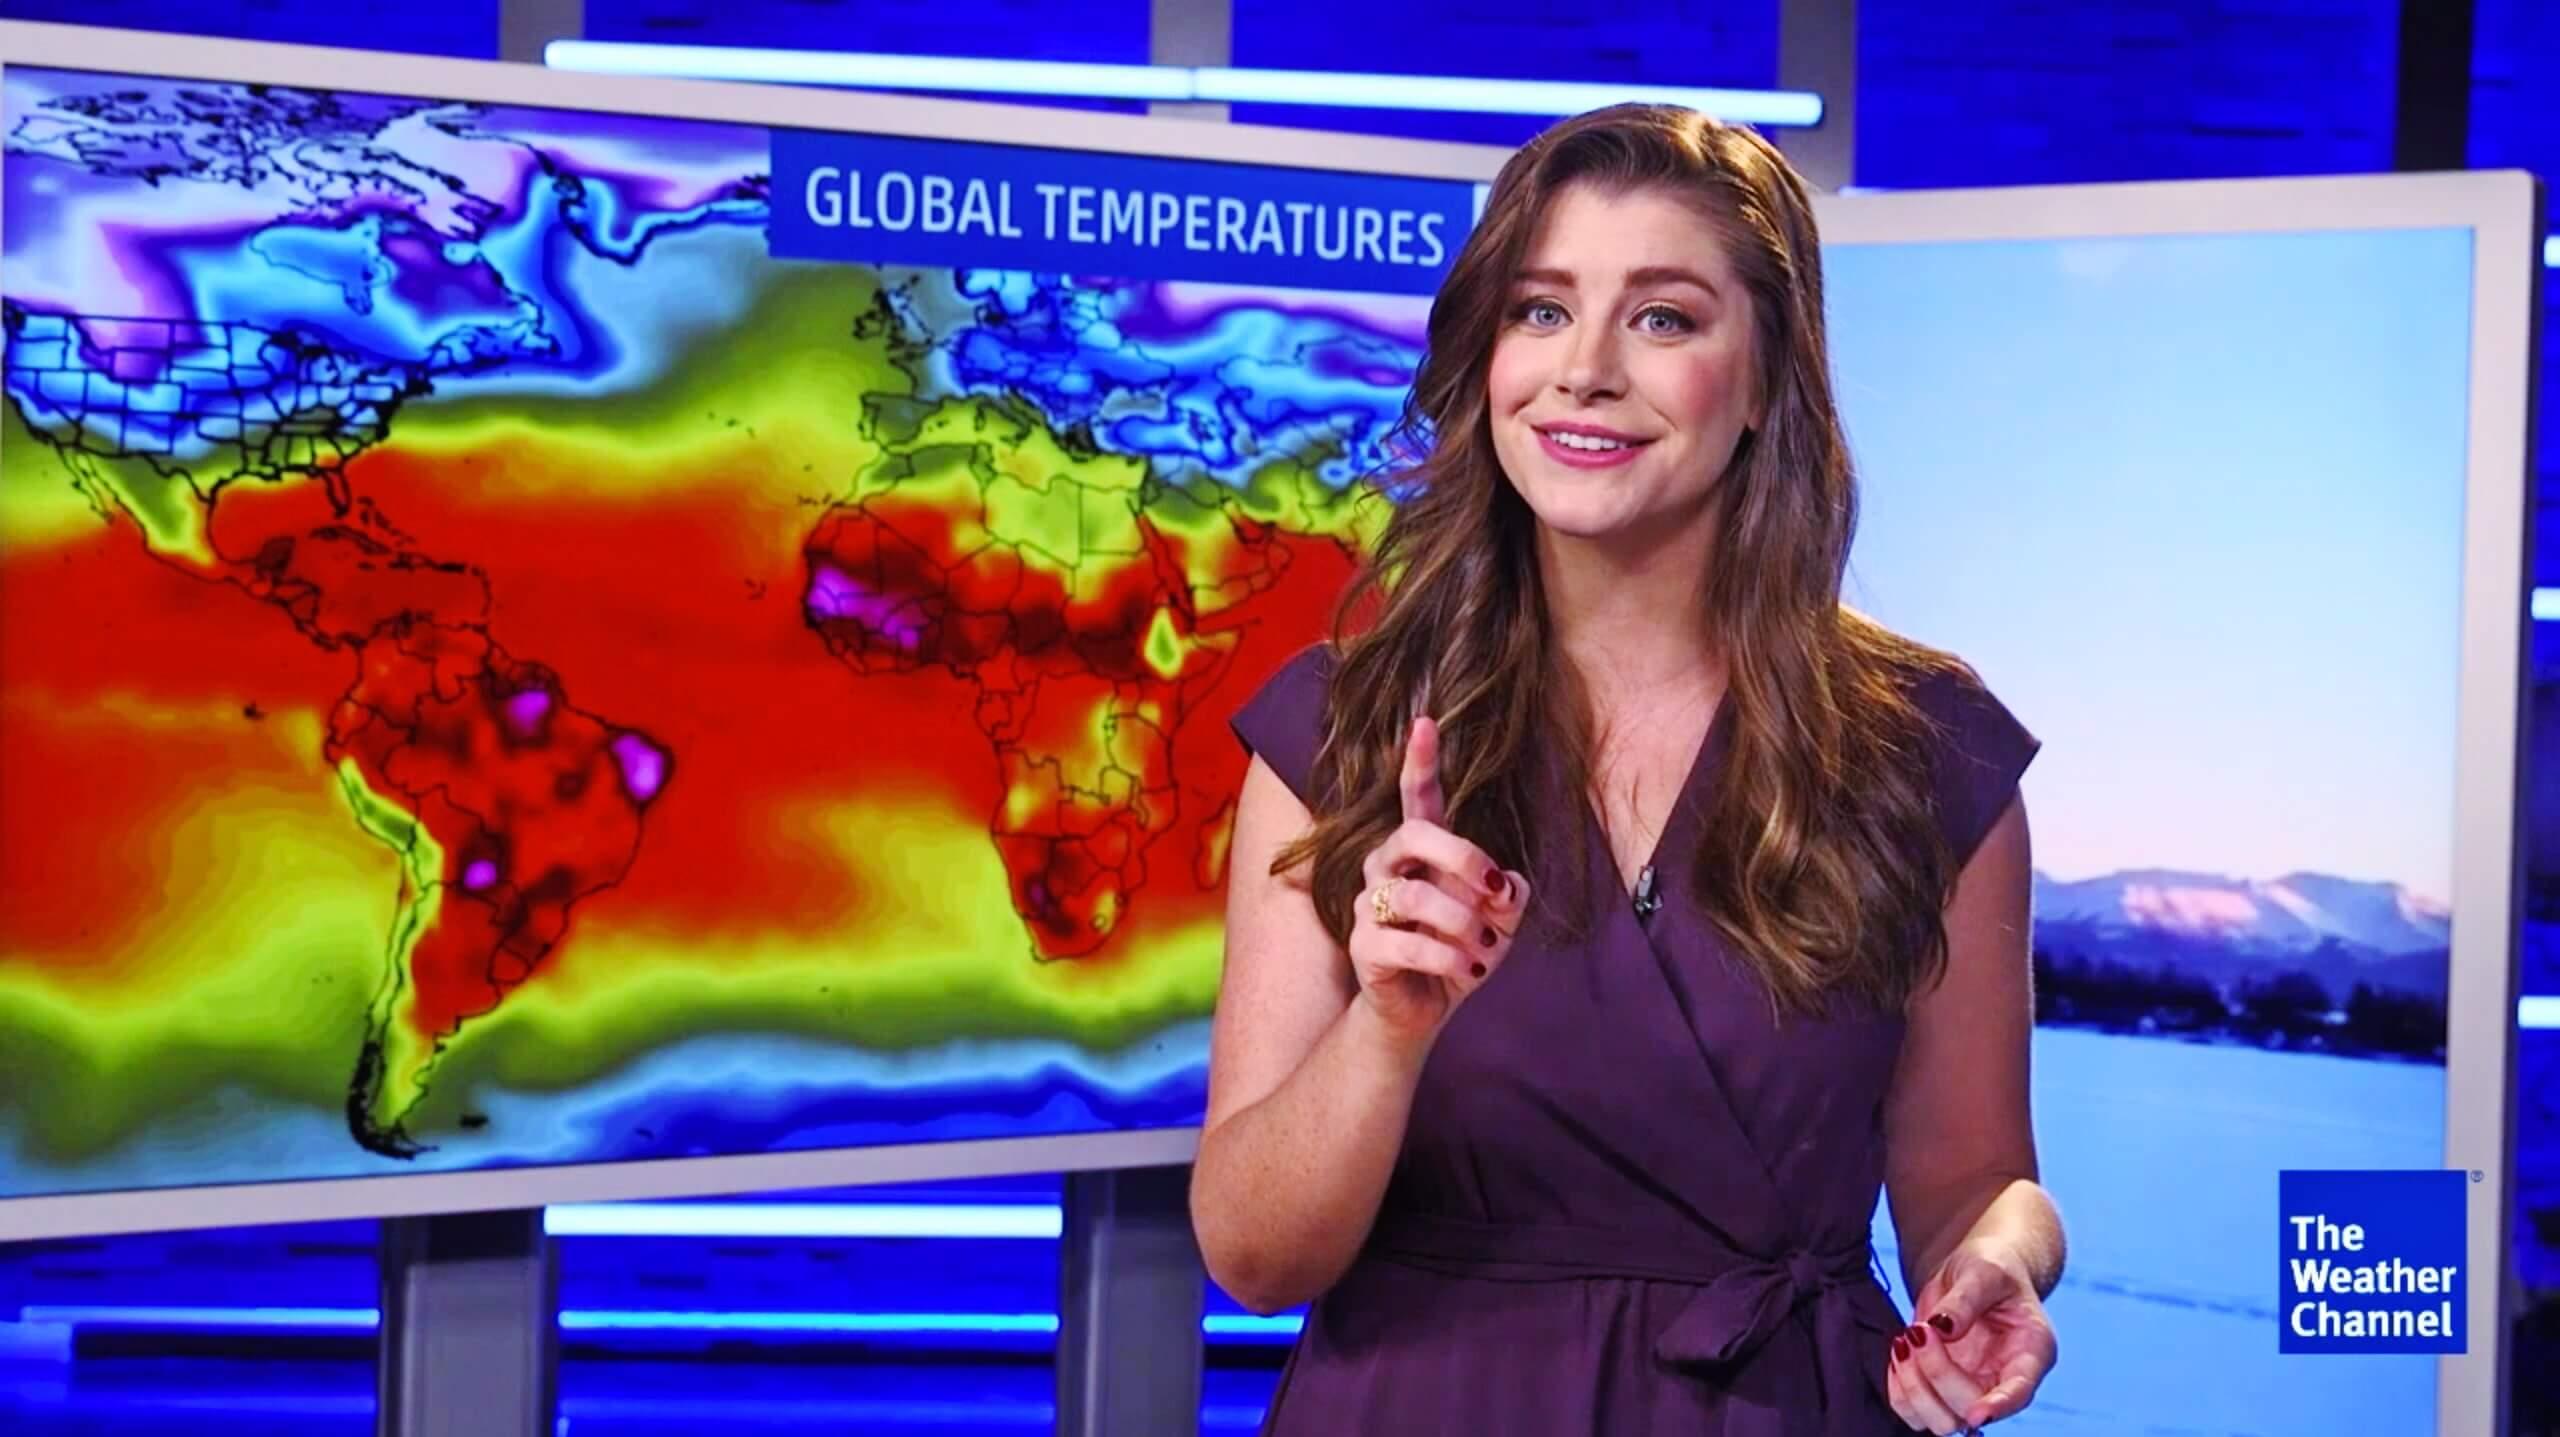 Nola ikusi The Weather Channel DirecTV-n